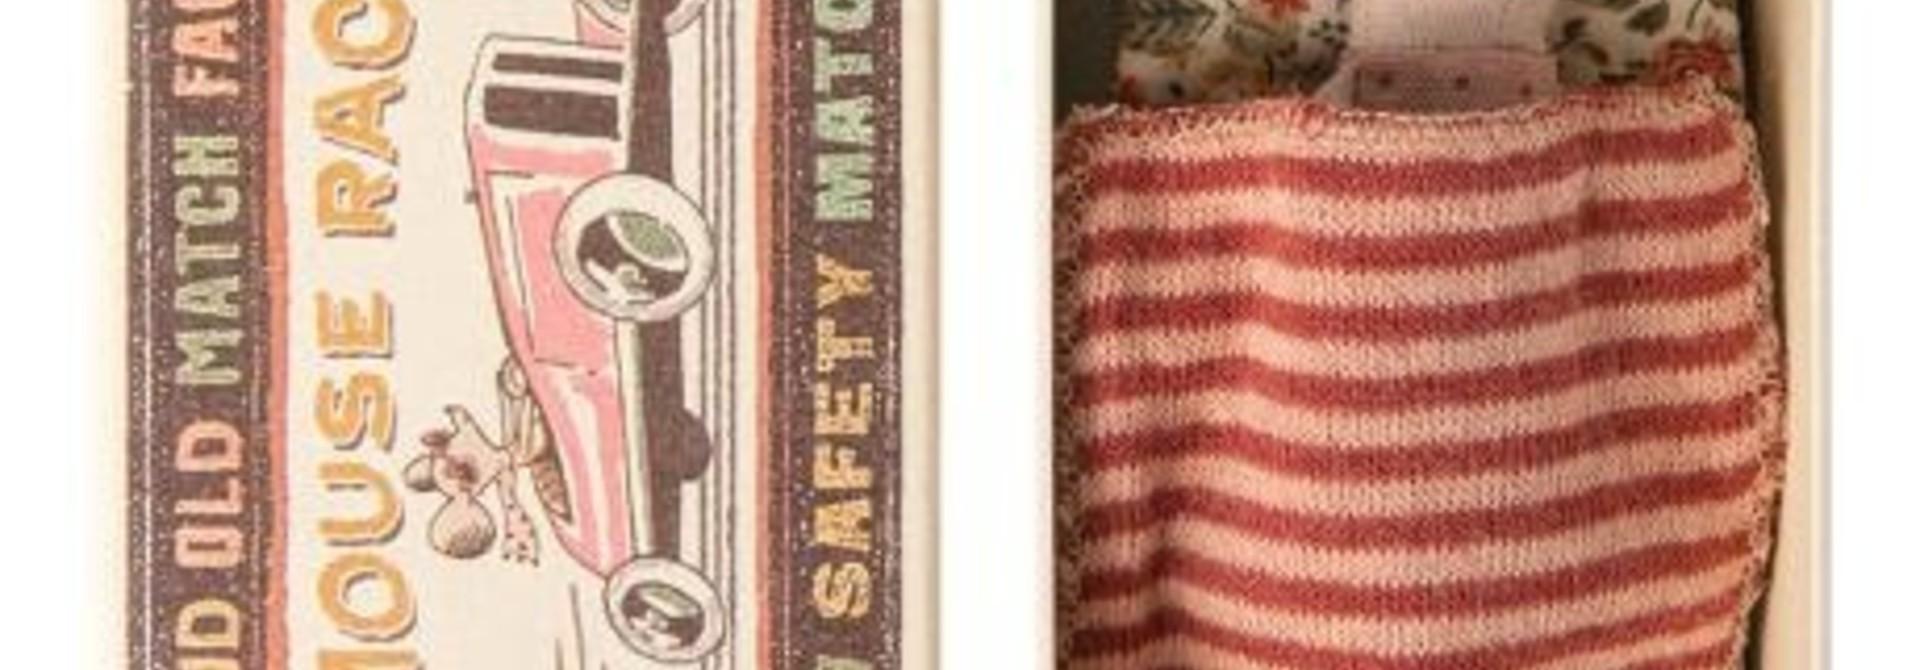 Maileg Big Sister Mouse/Matchbox - stripe rust